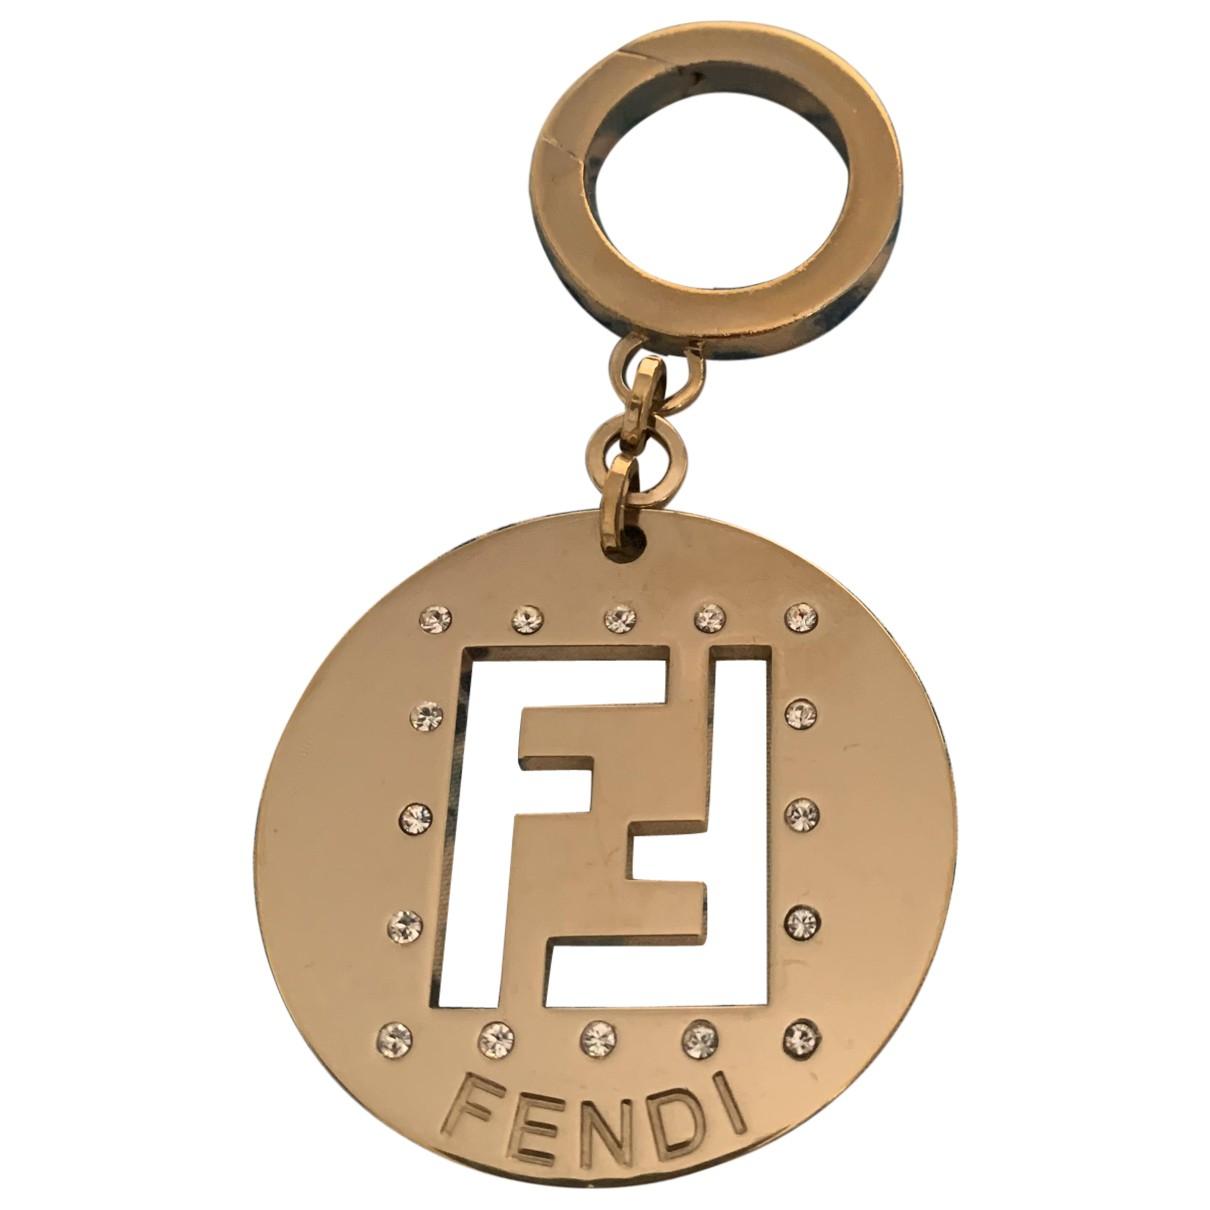 Fendi The Fendista Taschenschmuck in  Gold Metall